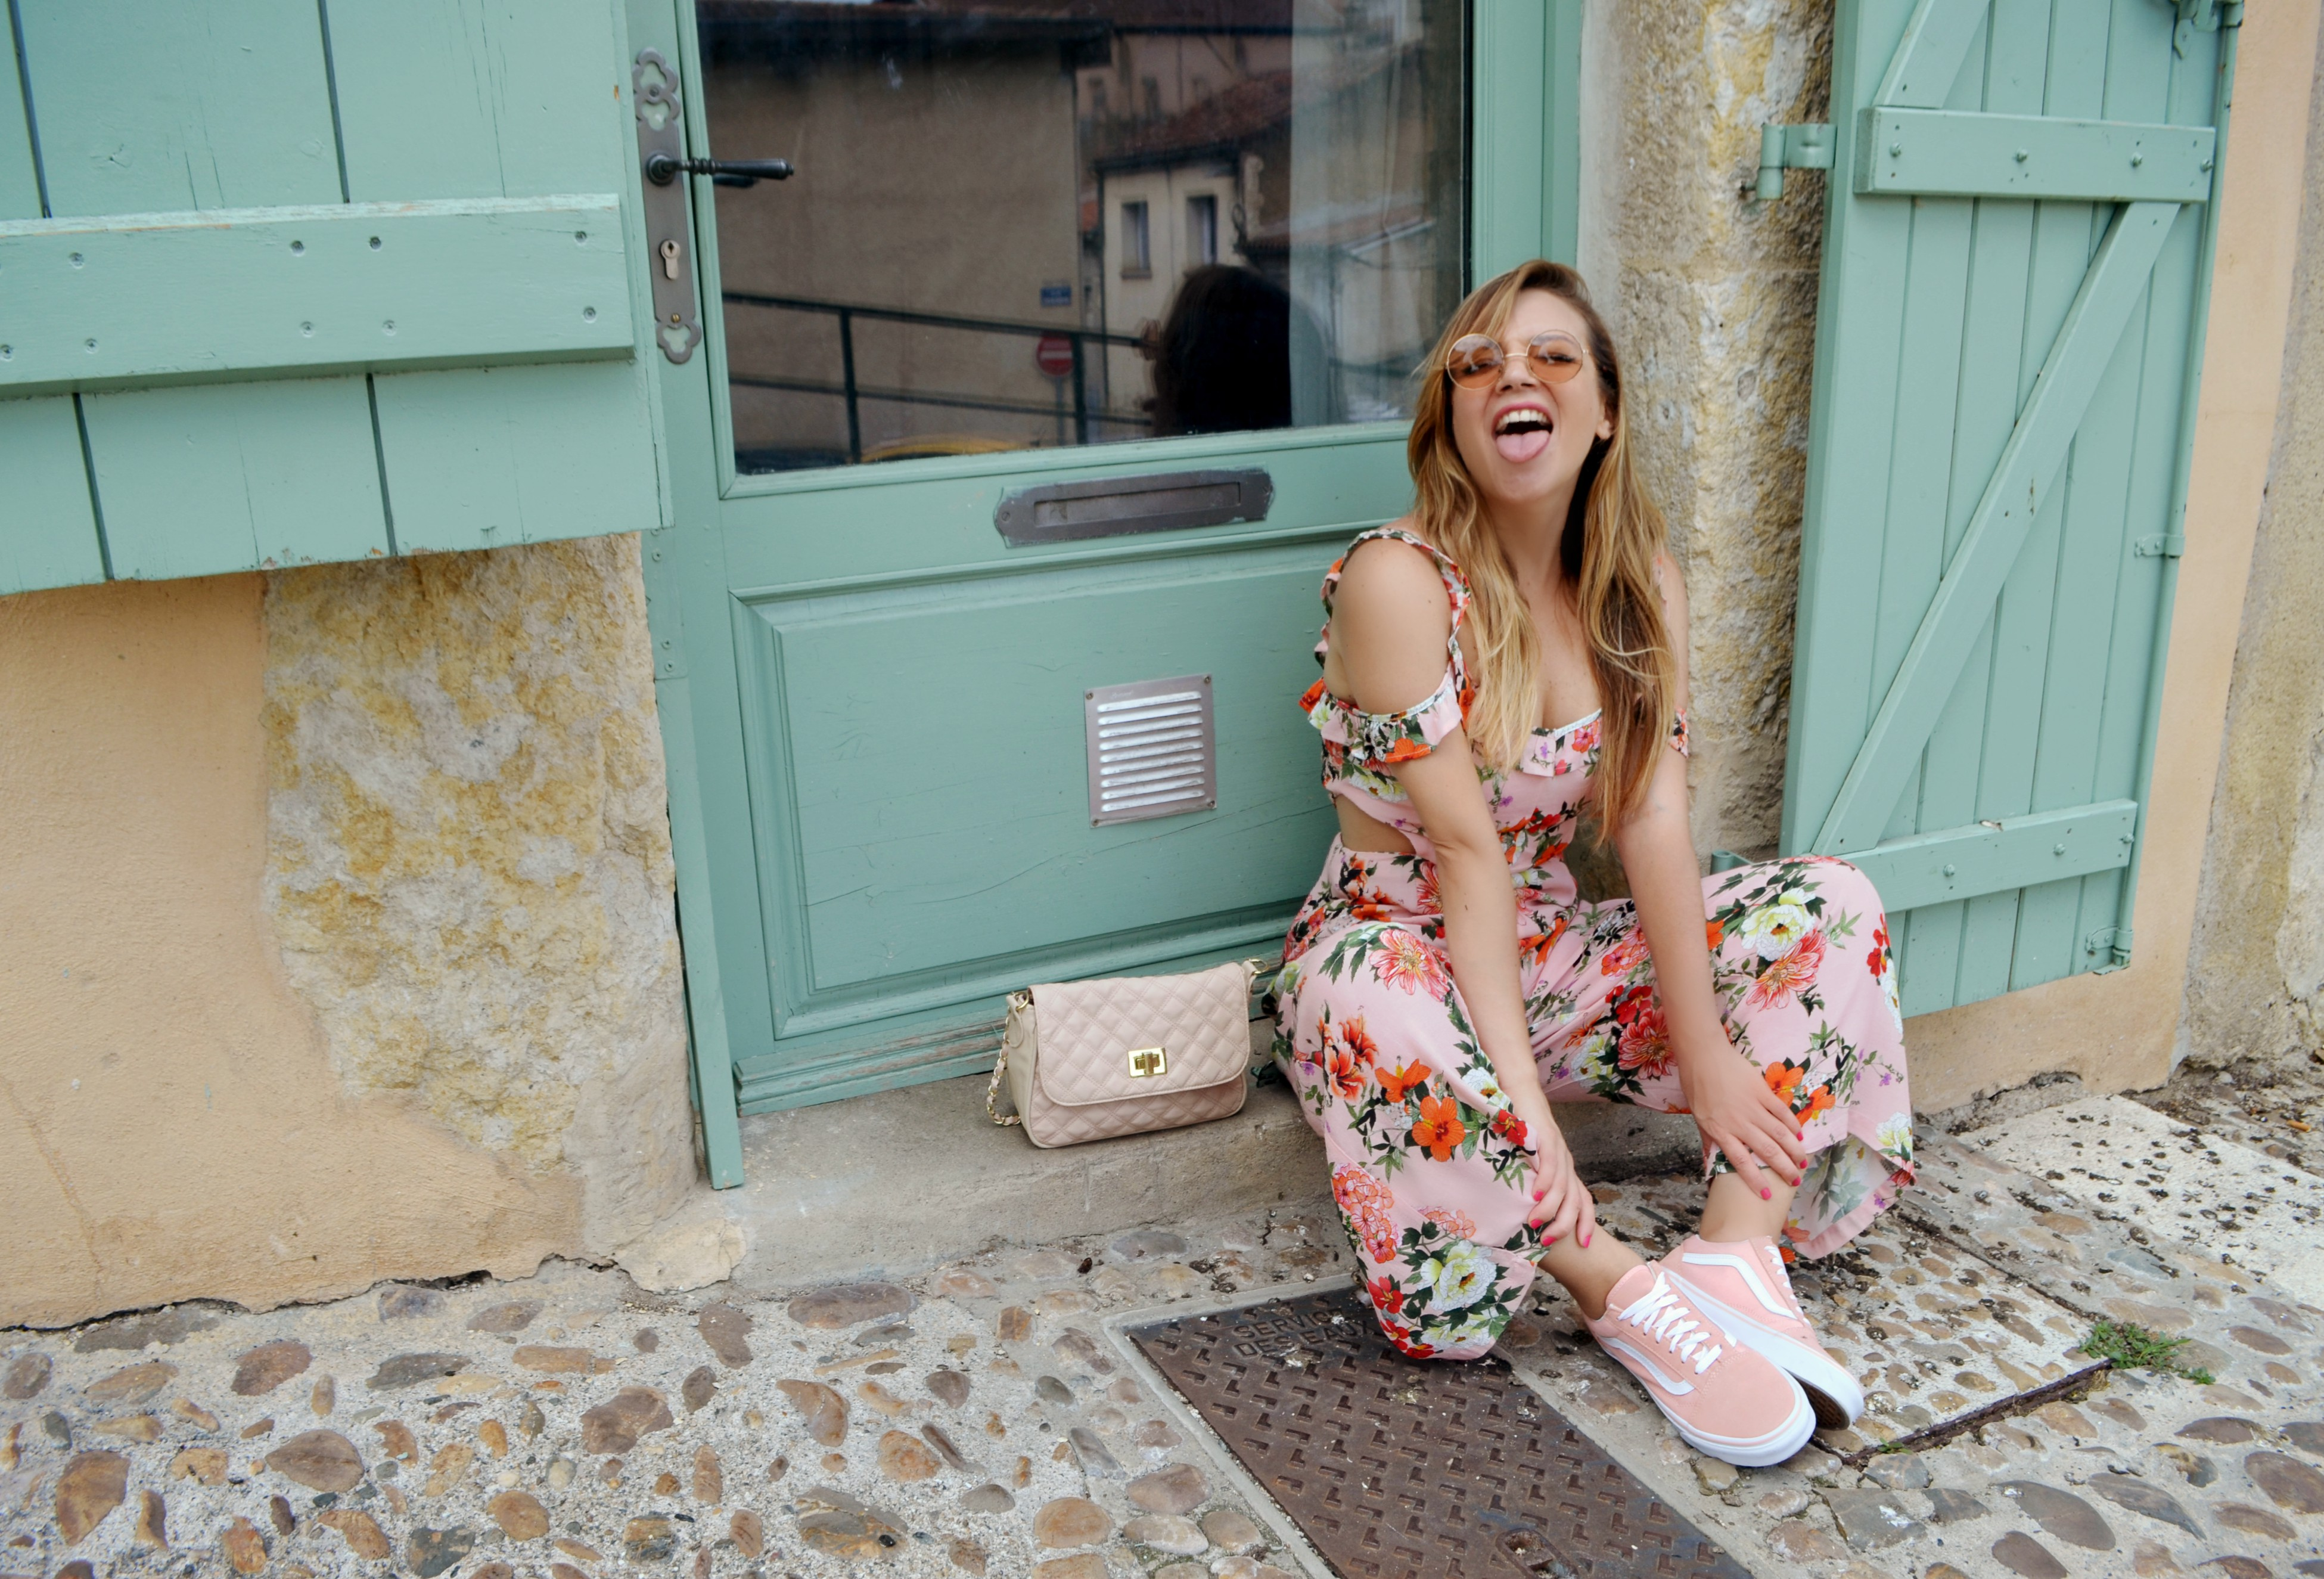 Vans-Old-Skool-jdsports-ChicAdicta-fashionista-Chic-Adicta-blog-de-moda-Auch-Francia-travel-blogger-look-pastel-PiensaenChic-Piensa-en-Chic